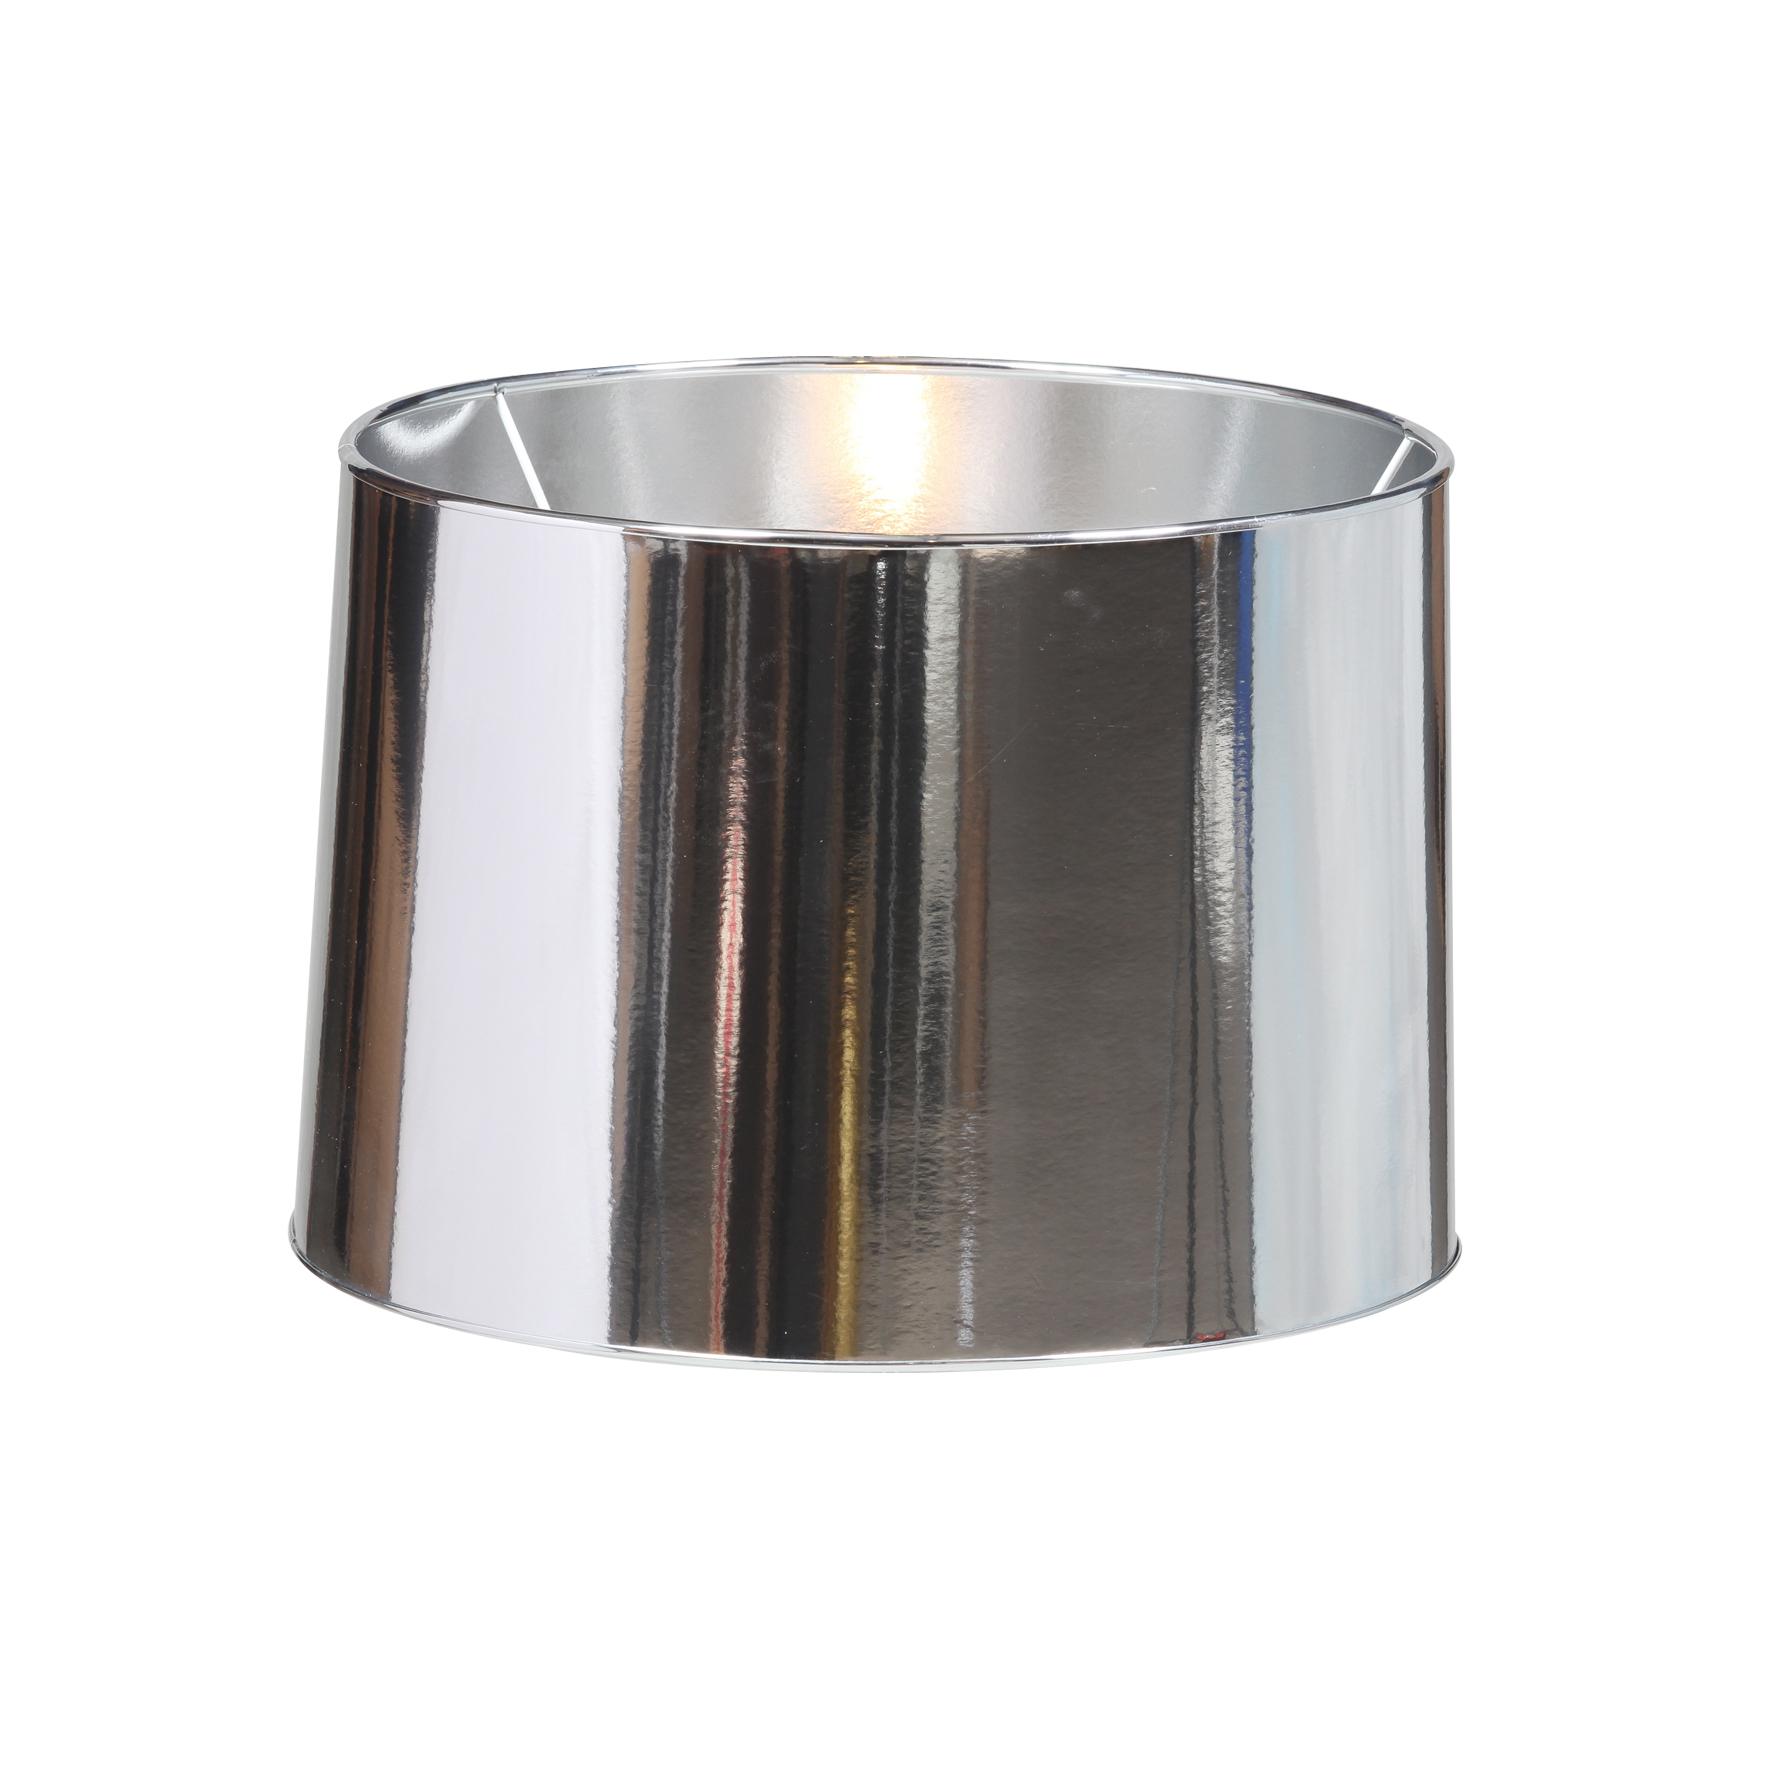 Large Metallic Silver Lamp Shade Les Trois Garcons Interiors